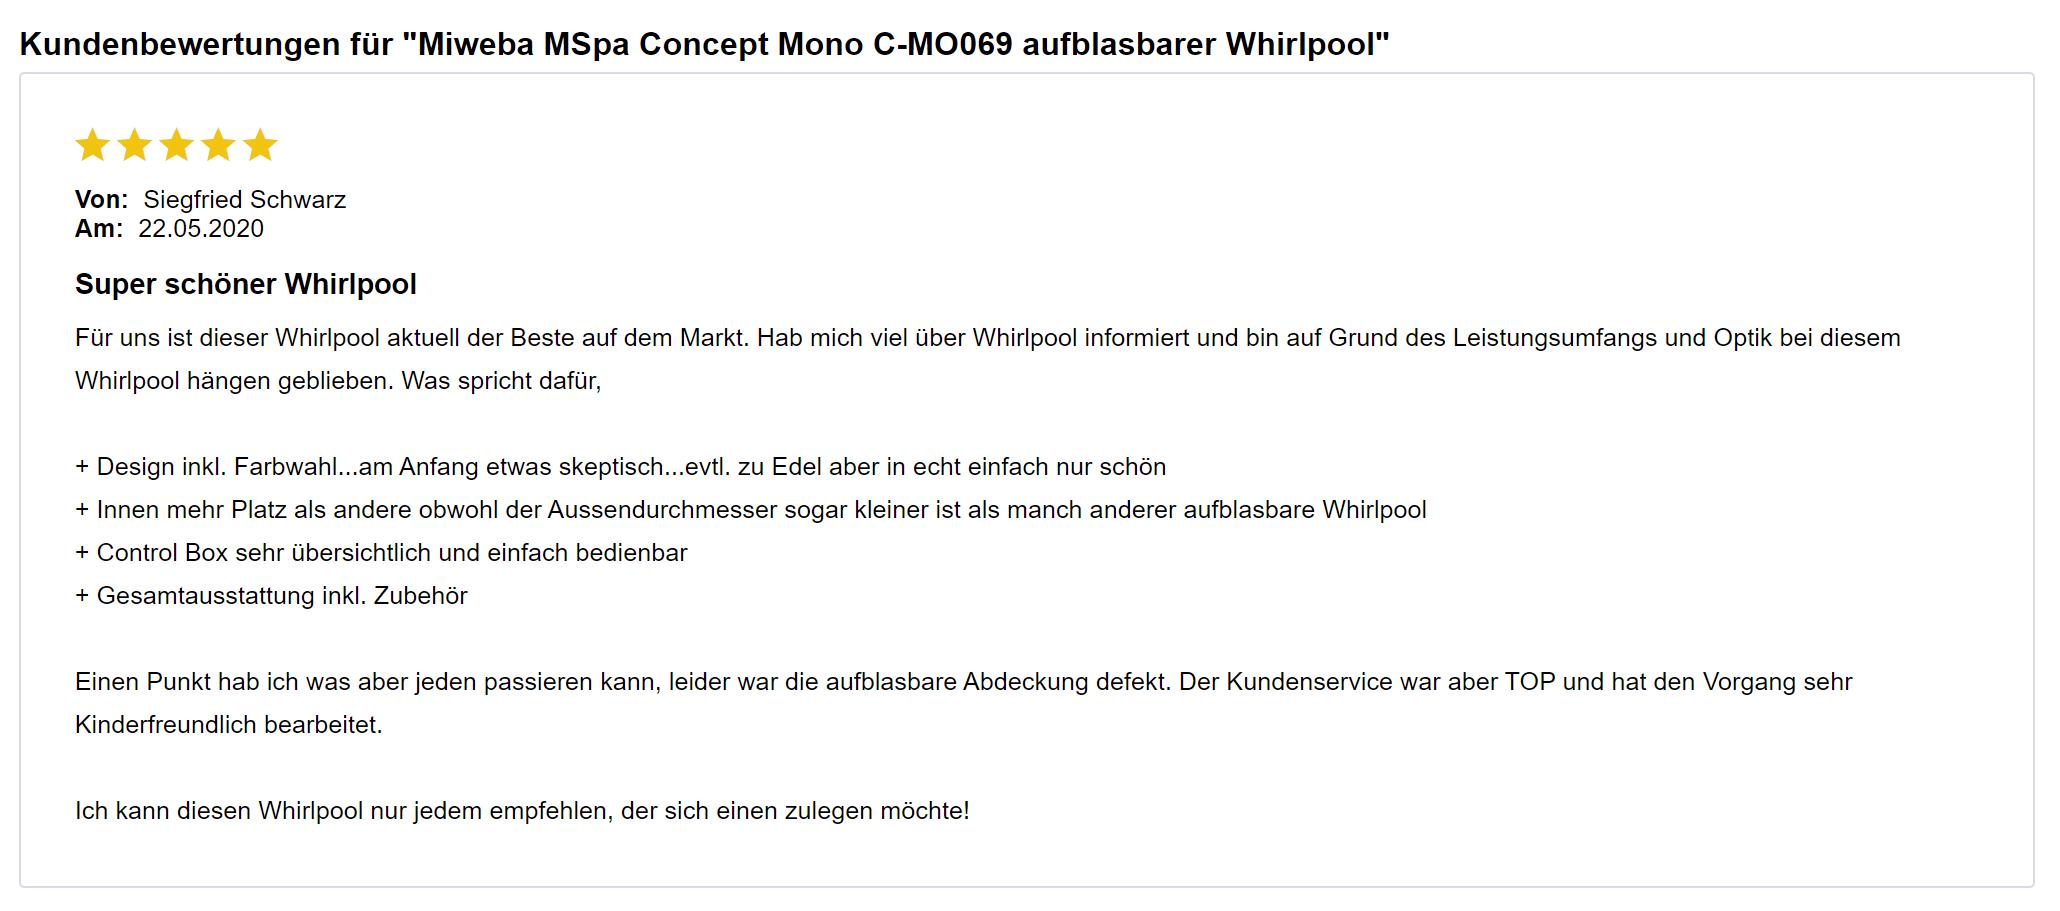 Kundenbewertungen zum Miweba MSpa Concept Mono C-MO069 Whirlpool aufblasbar